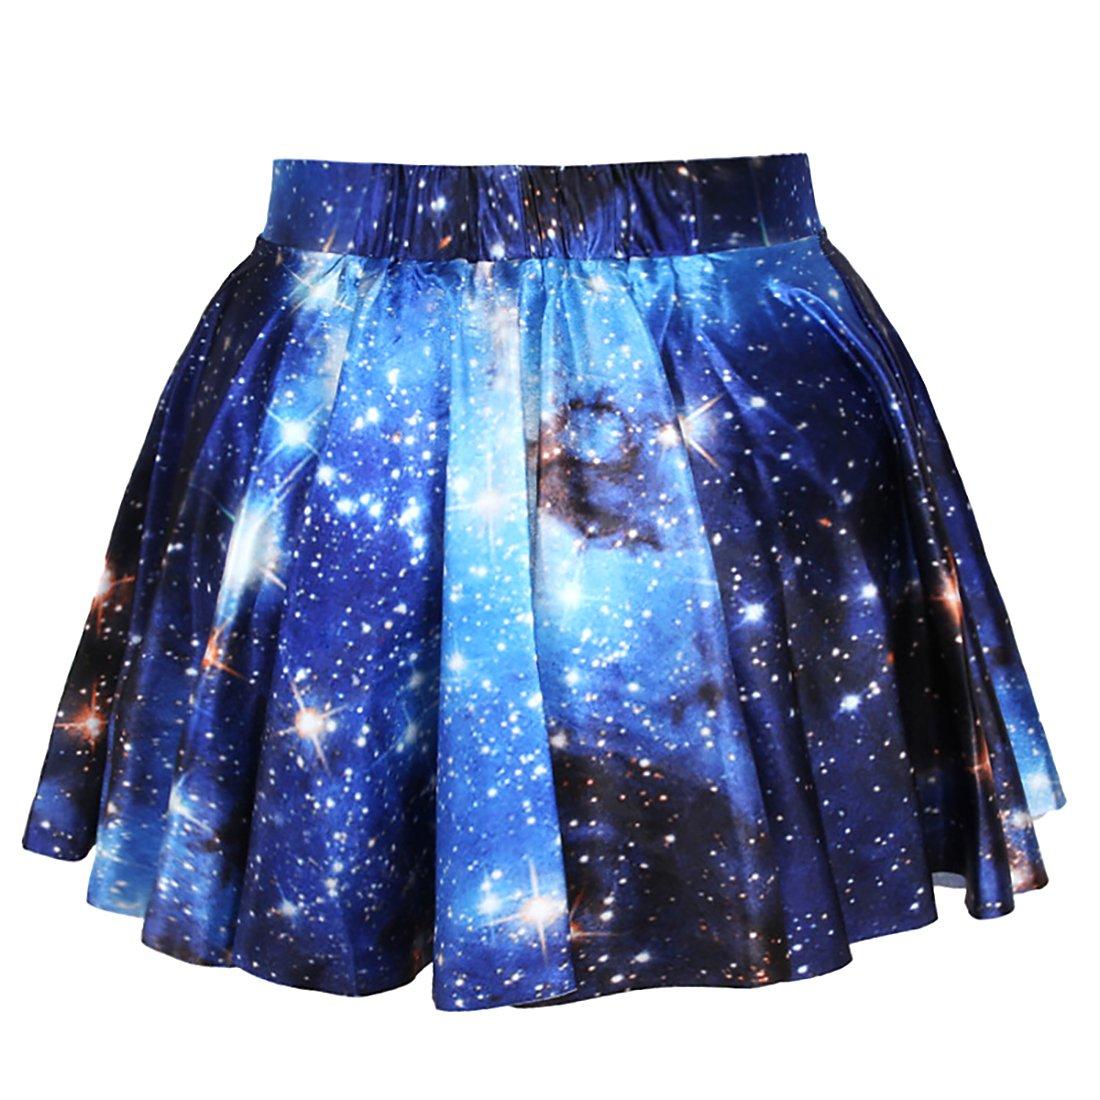 Women 3D Galaxy Print Stretchy Flared Pleated High Waist Skirt Casual Mini Skirt 3D Galax Mini Skirts Puedo